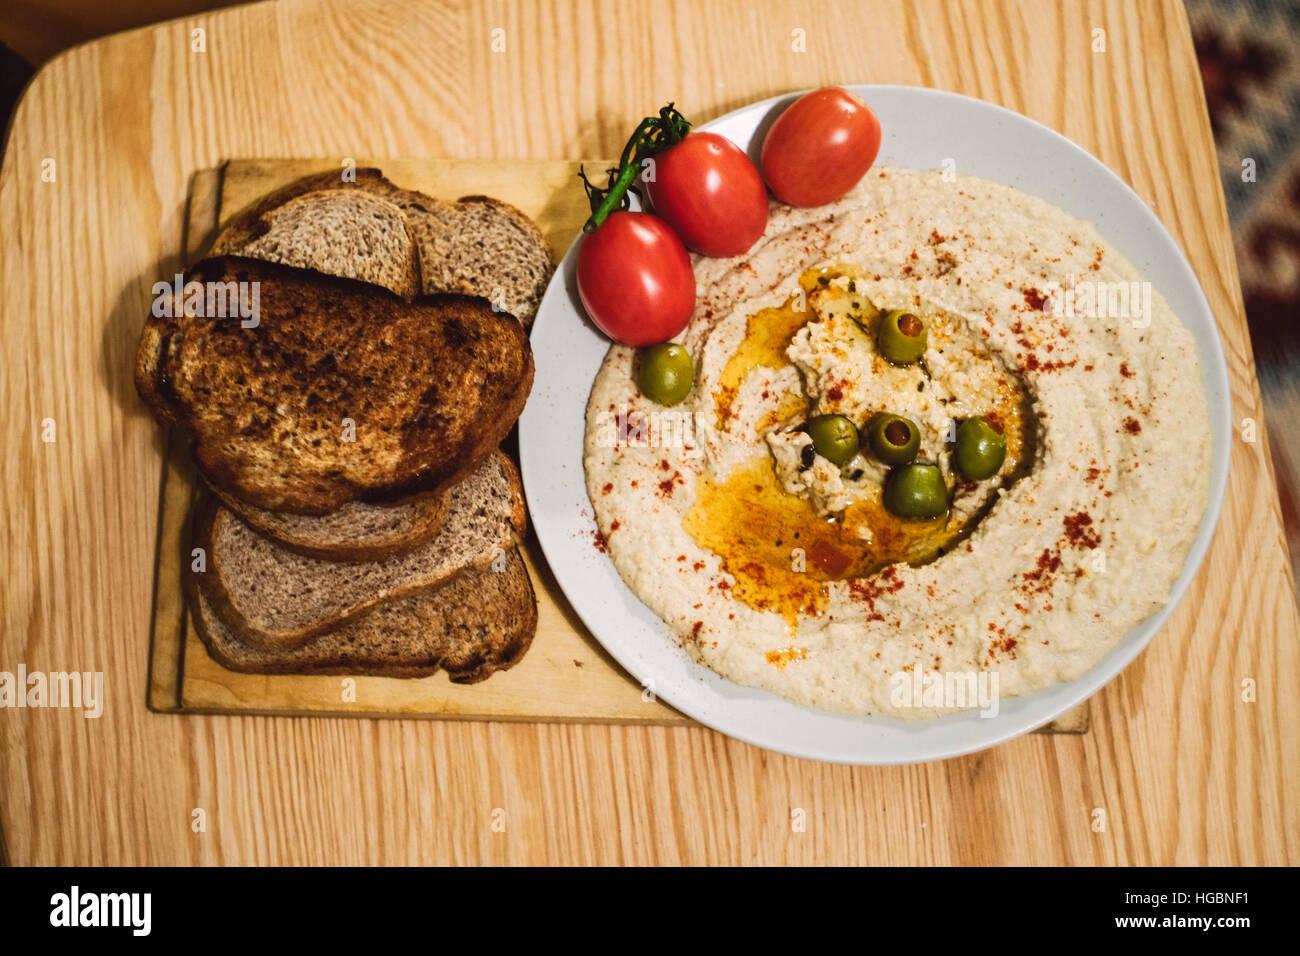 Homemade humus food. - Stock Image